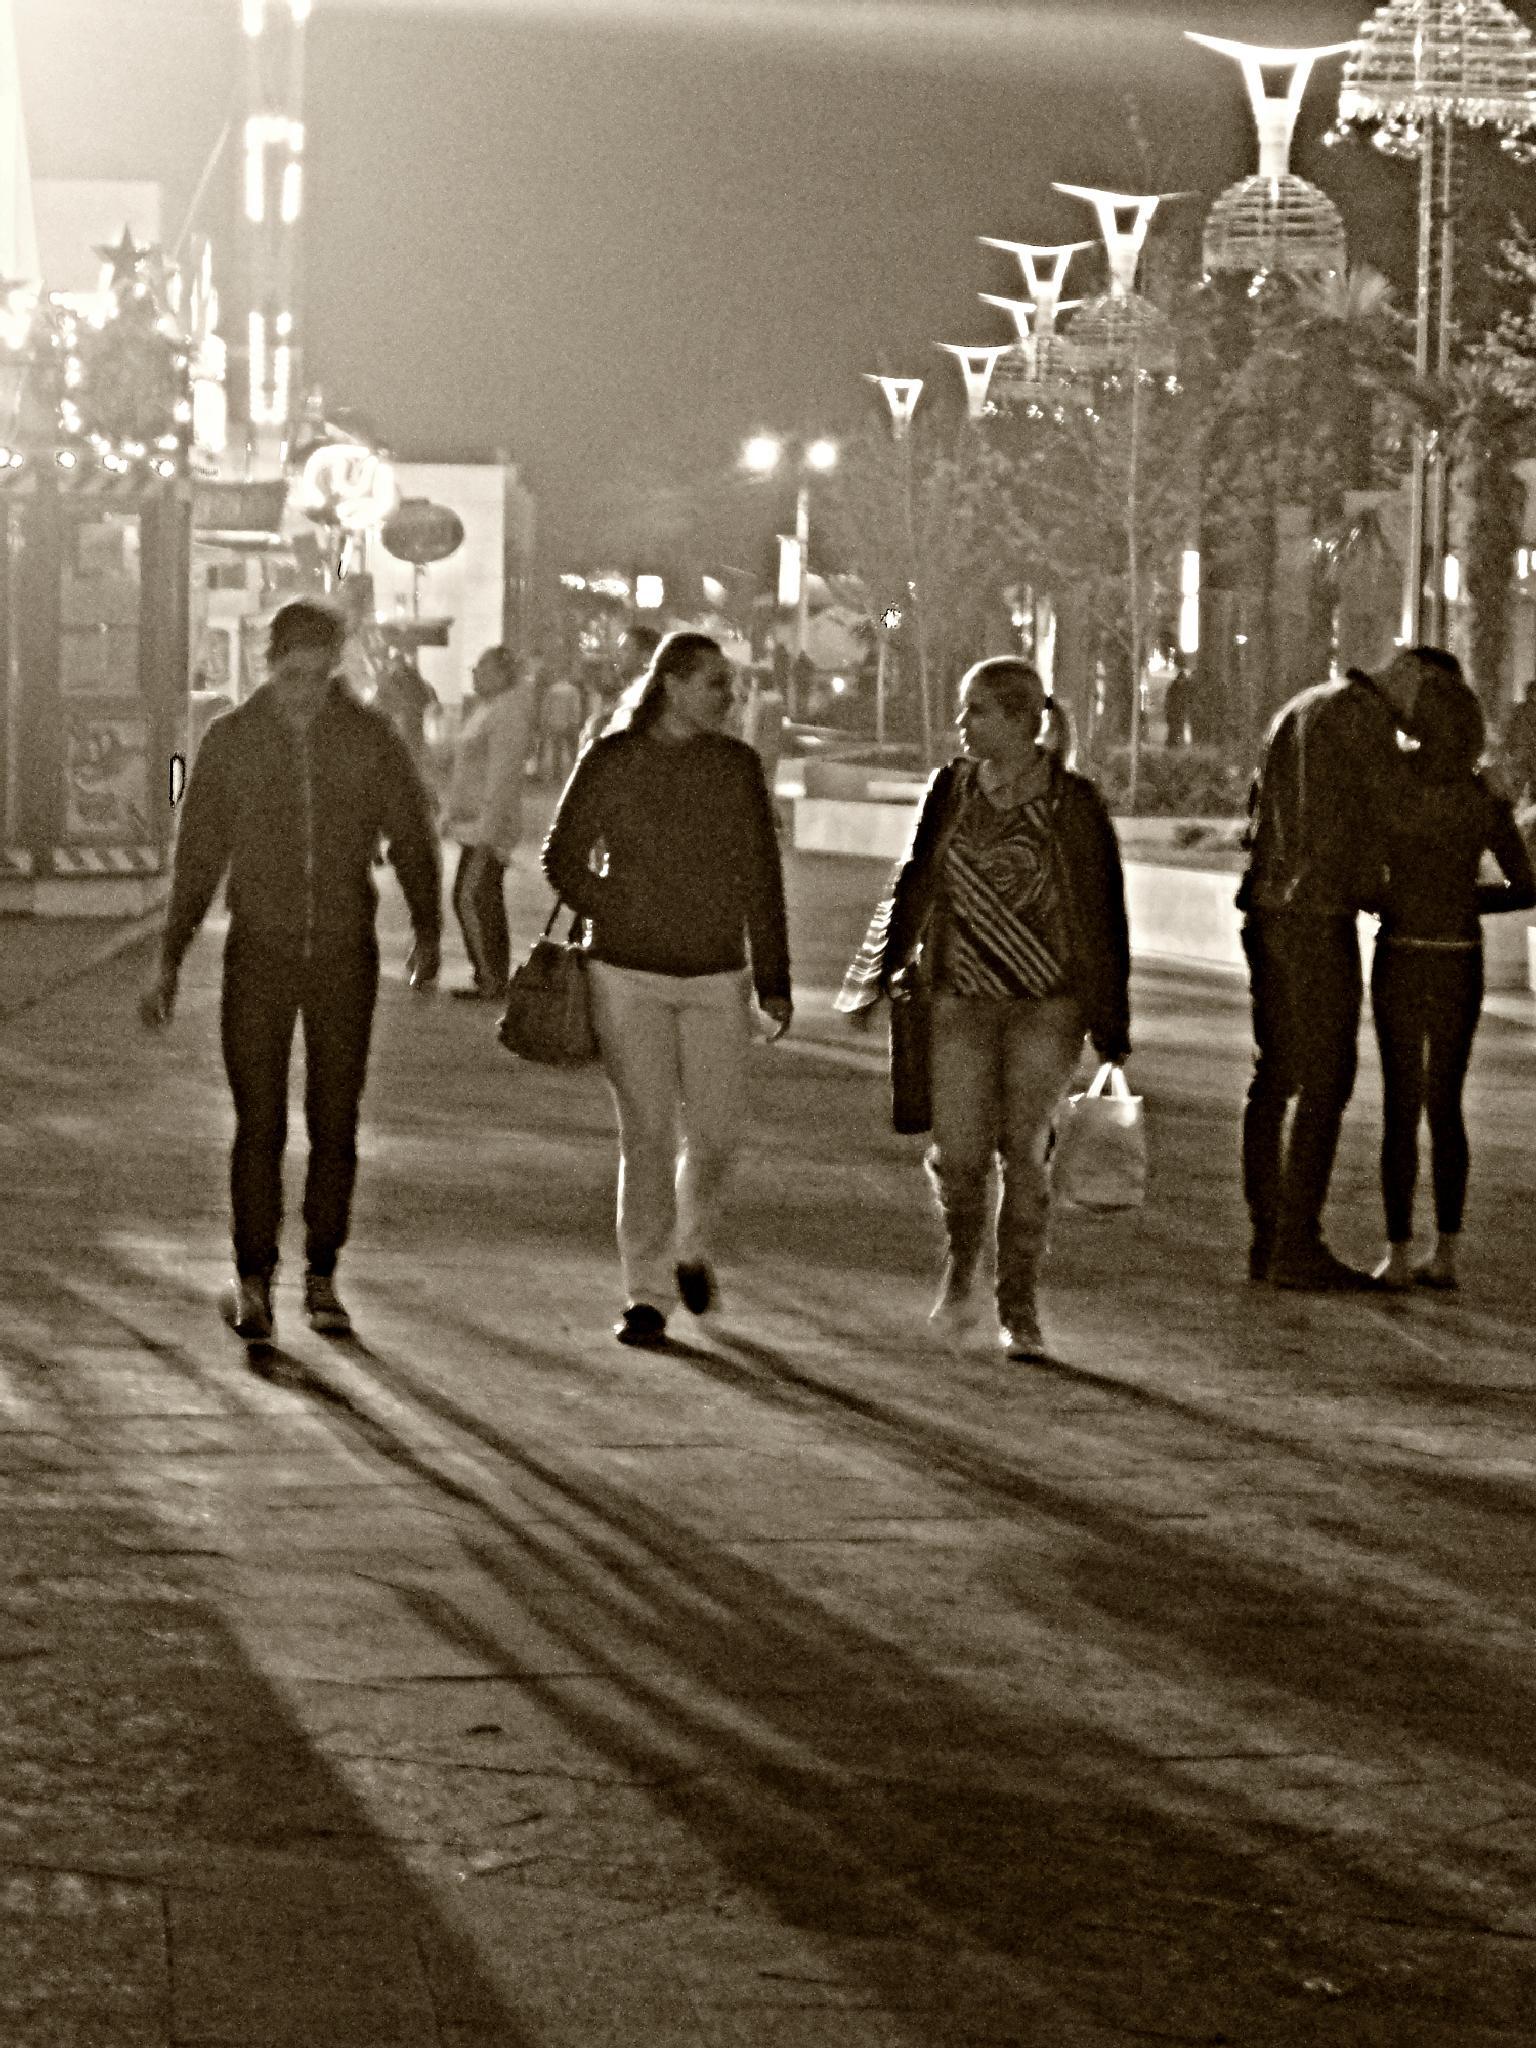 Gang by Dmitriy Sokolov